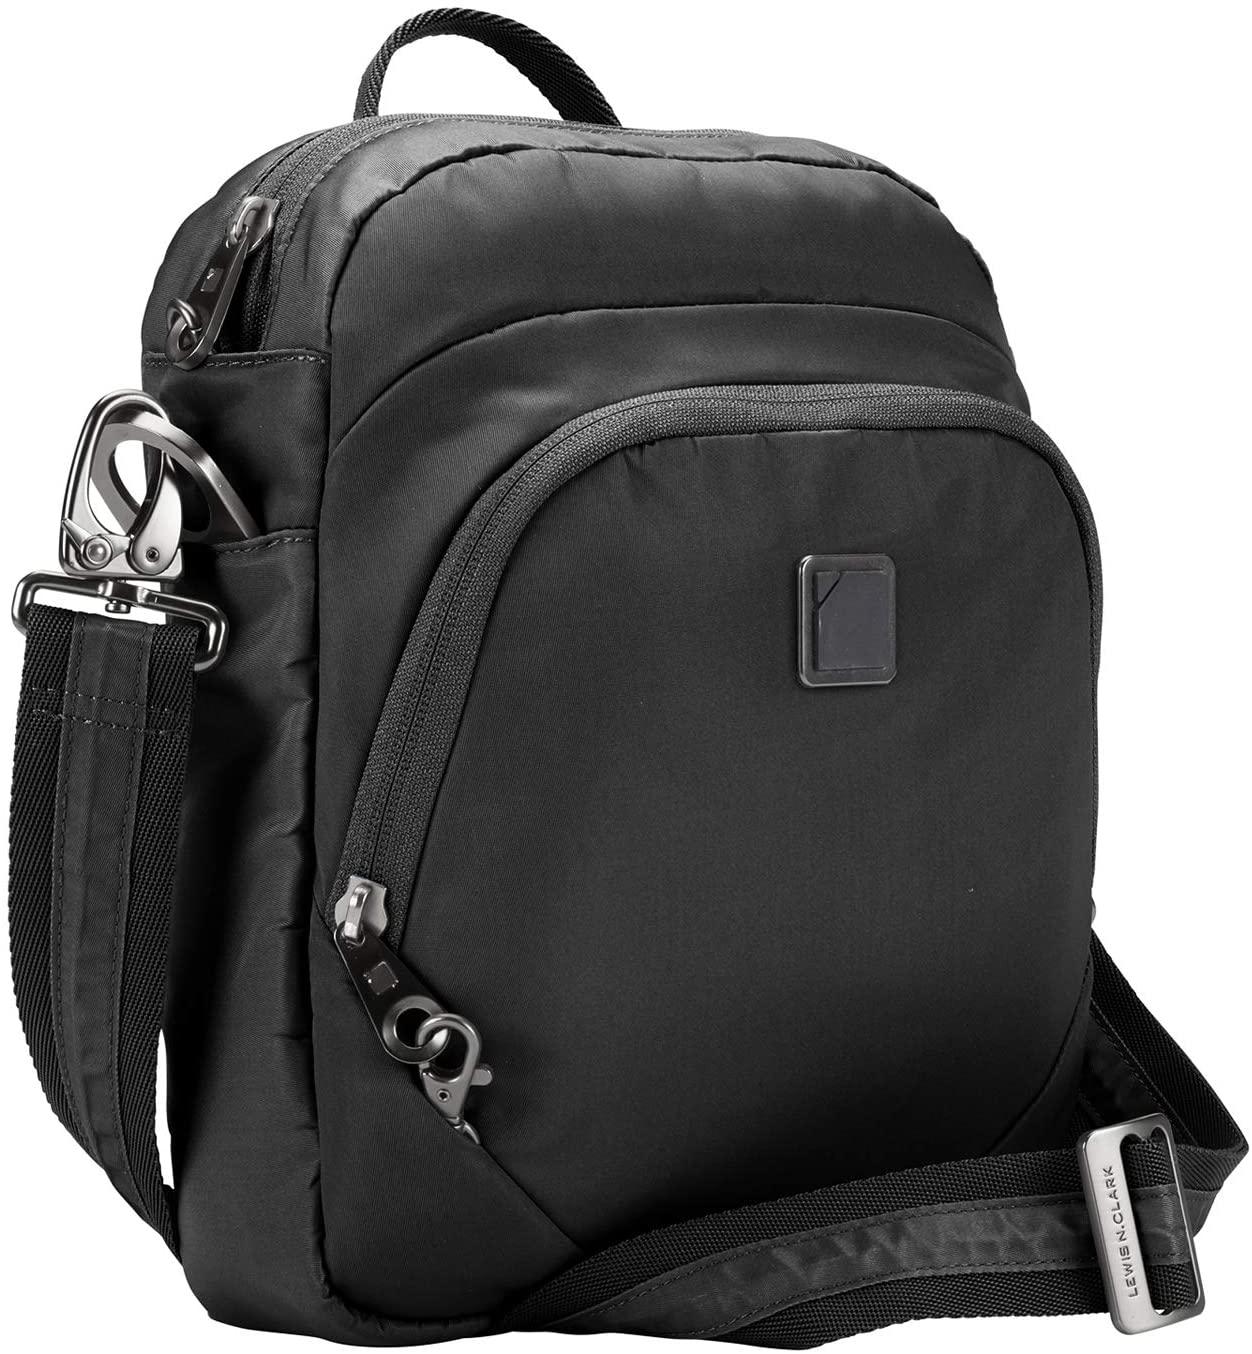 Lewis N. Clark Secura RFID Blocking Anti-Theft Backpack + Crossbody Bag for Travel, Onyx